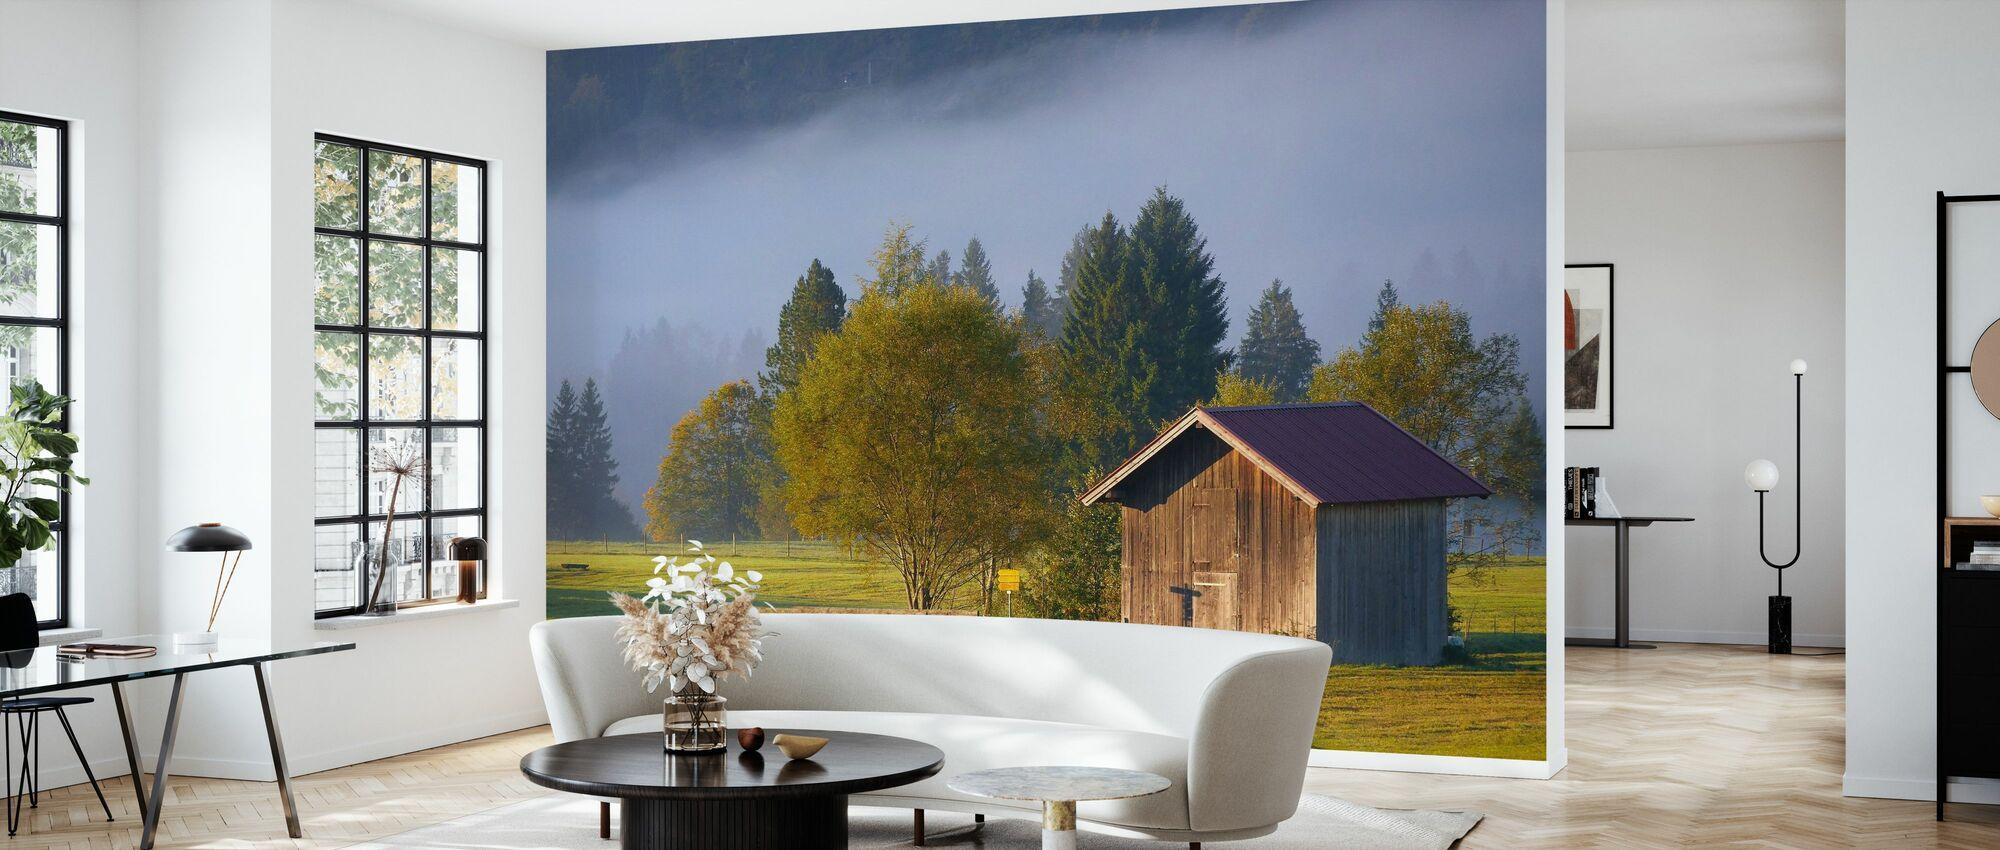 Barn - Wallpaper - Living Room